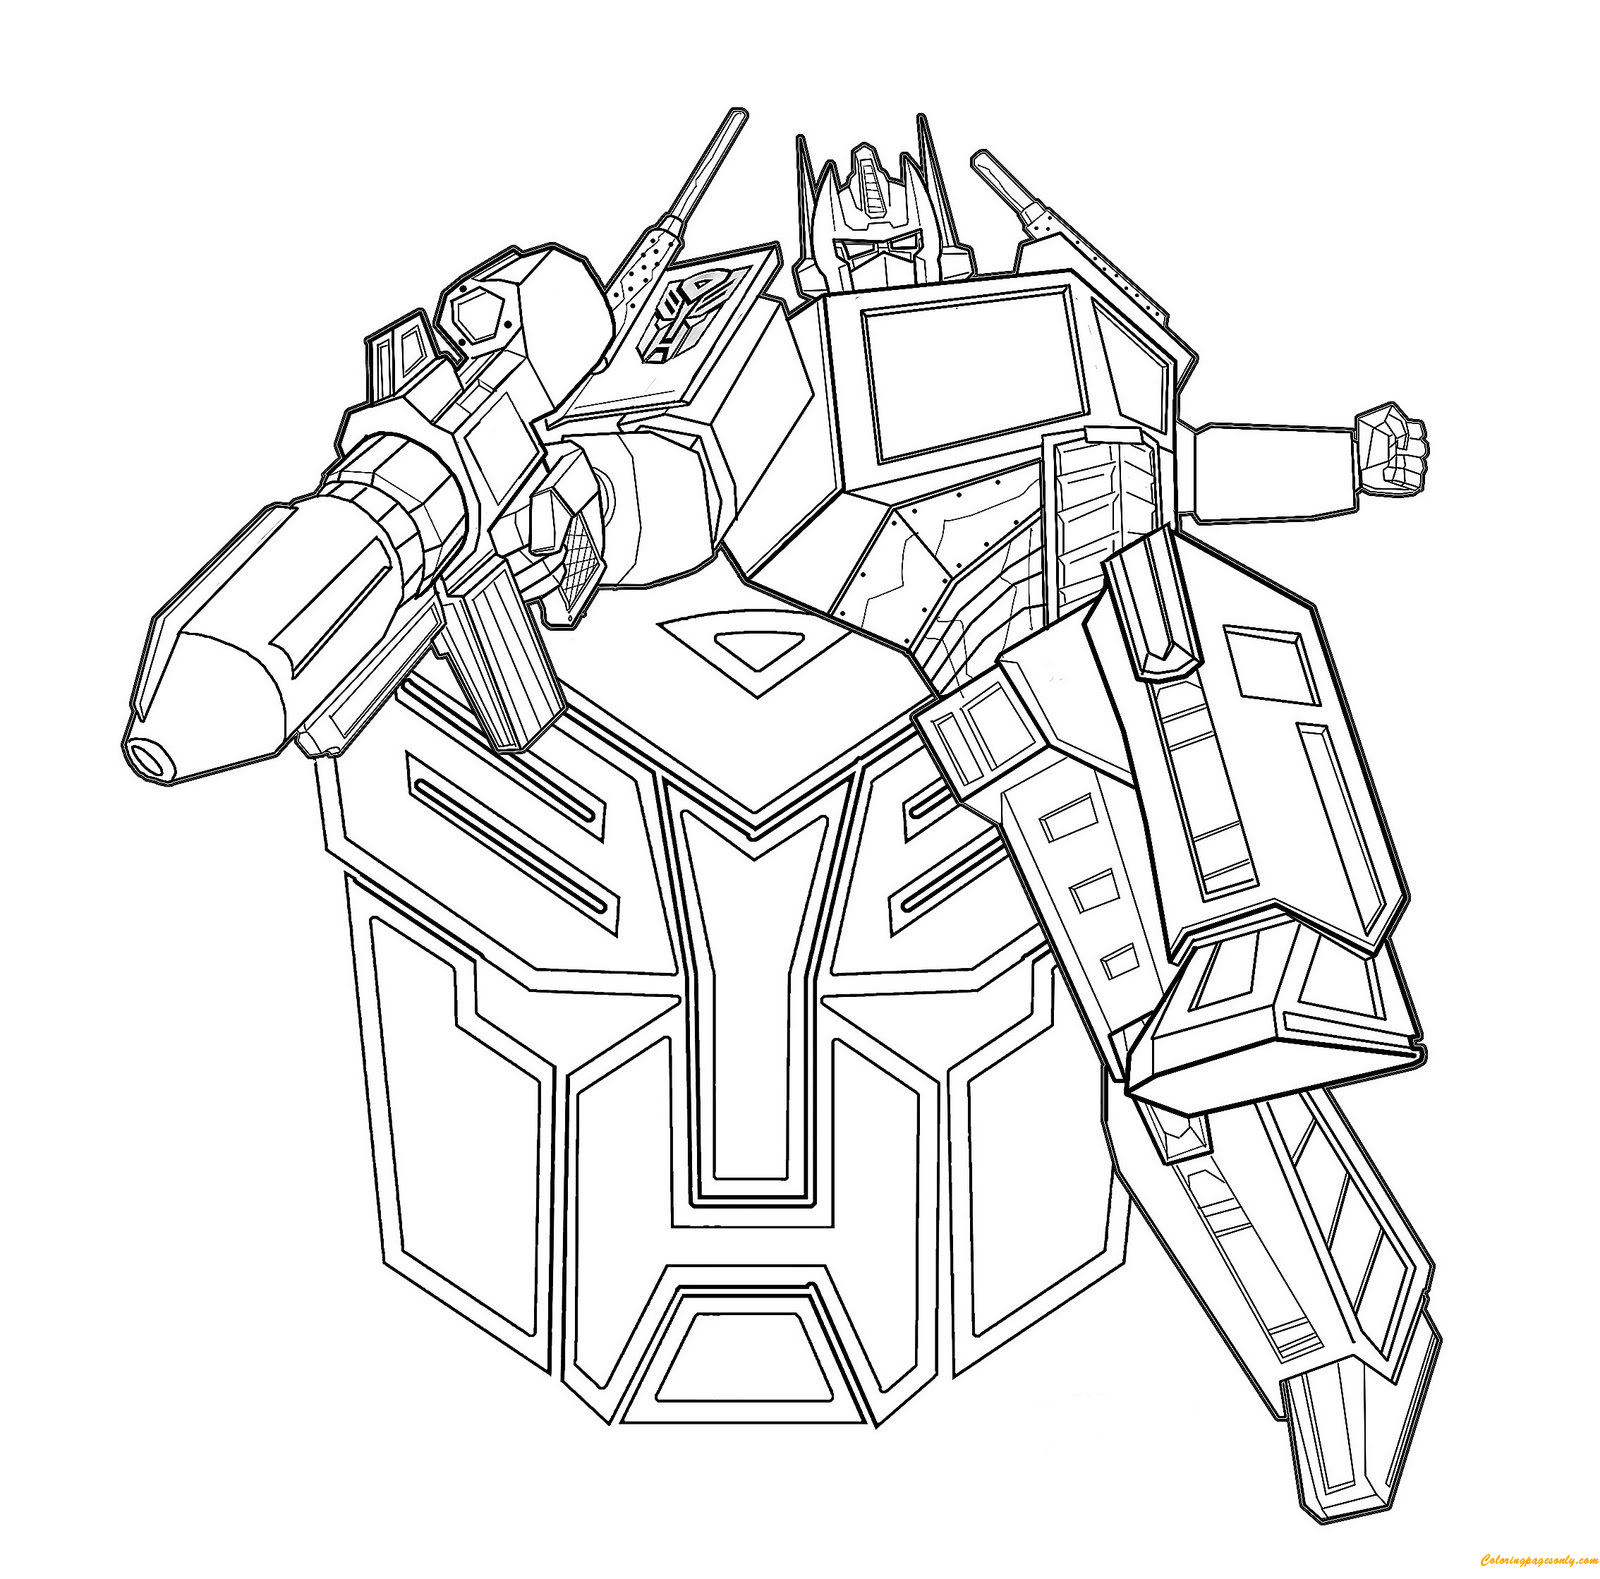 Soundwave by NgBoy on DeviantArt | Transformers artwork ... | 1579x1600